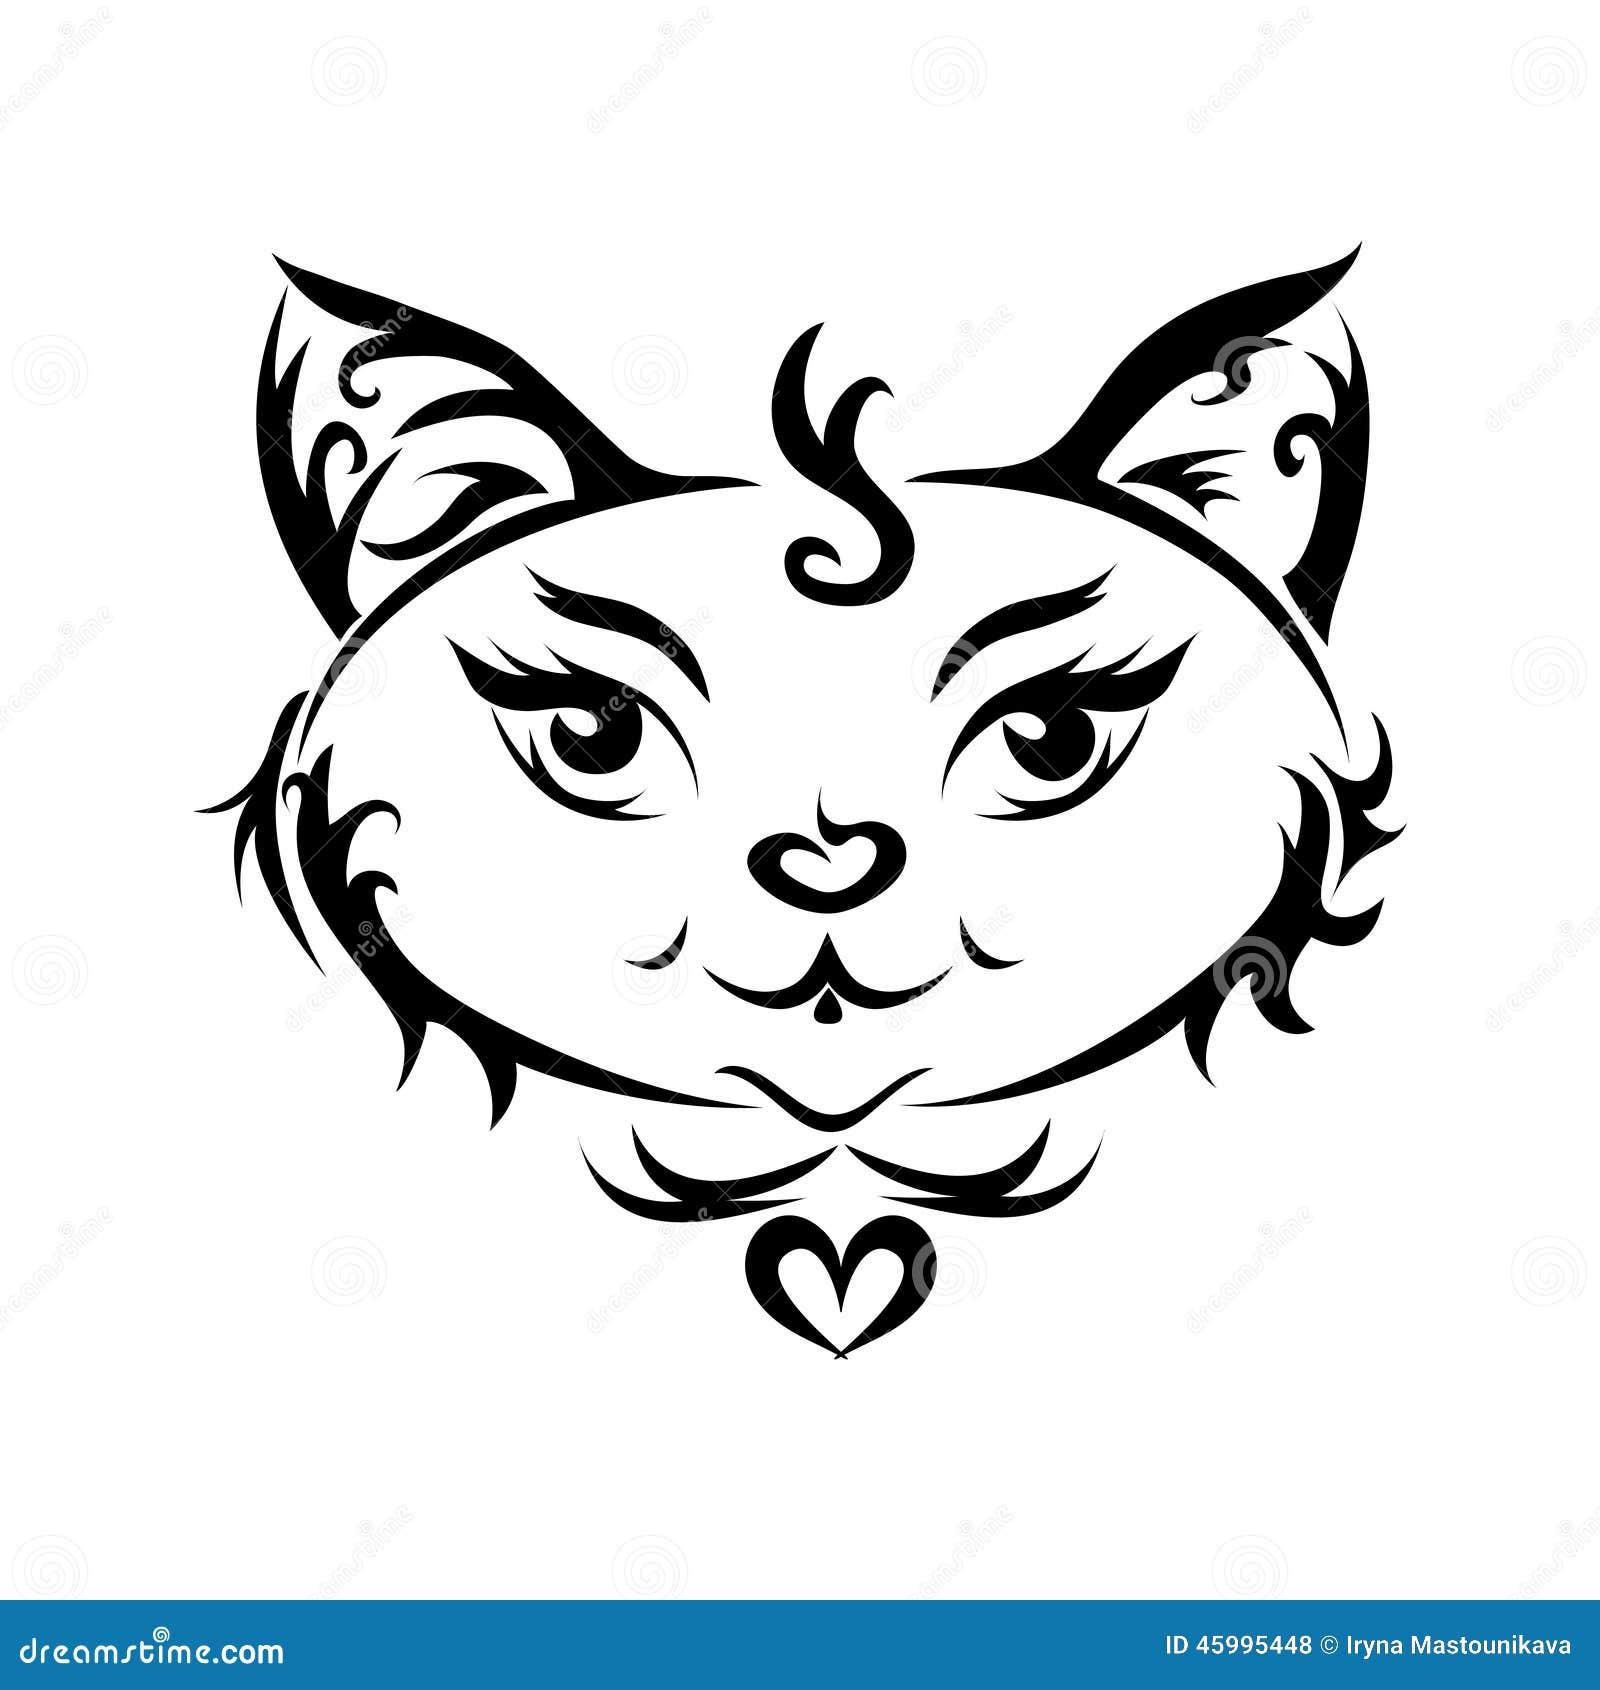 Tatouage chat noir galerie tatouage - Tatouage chat noir ...